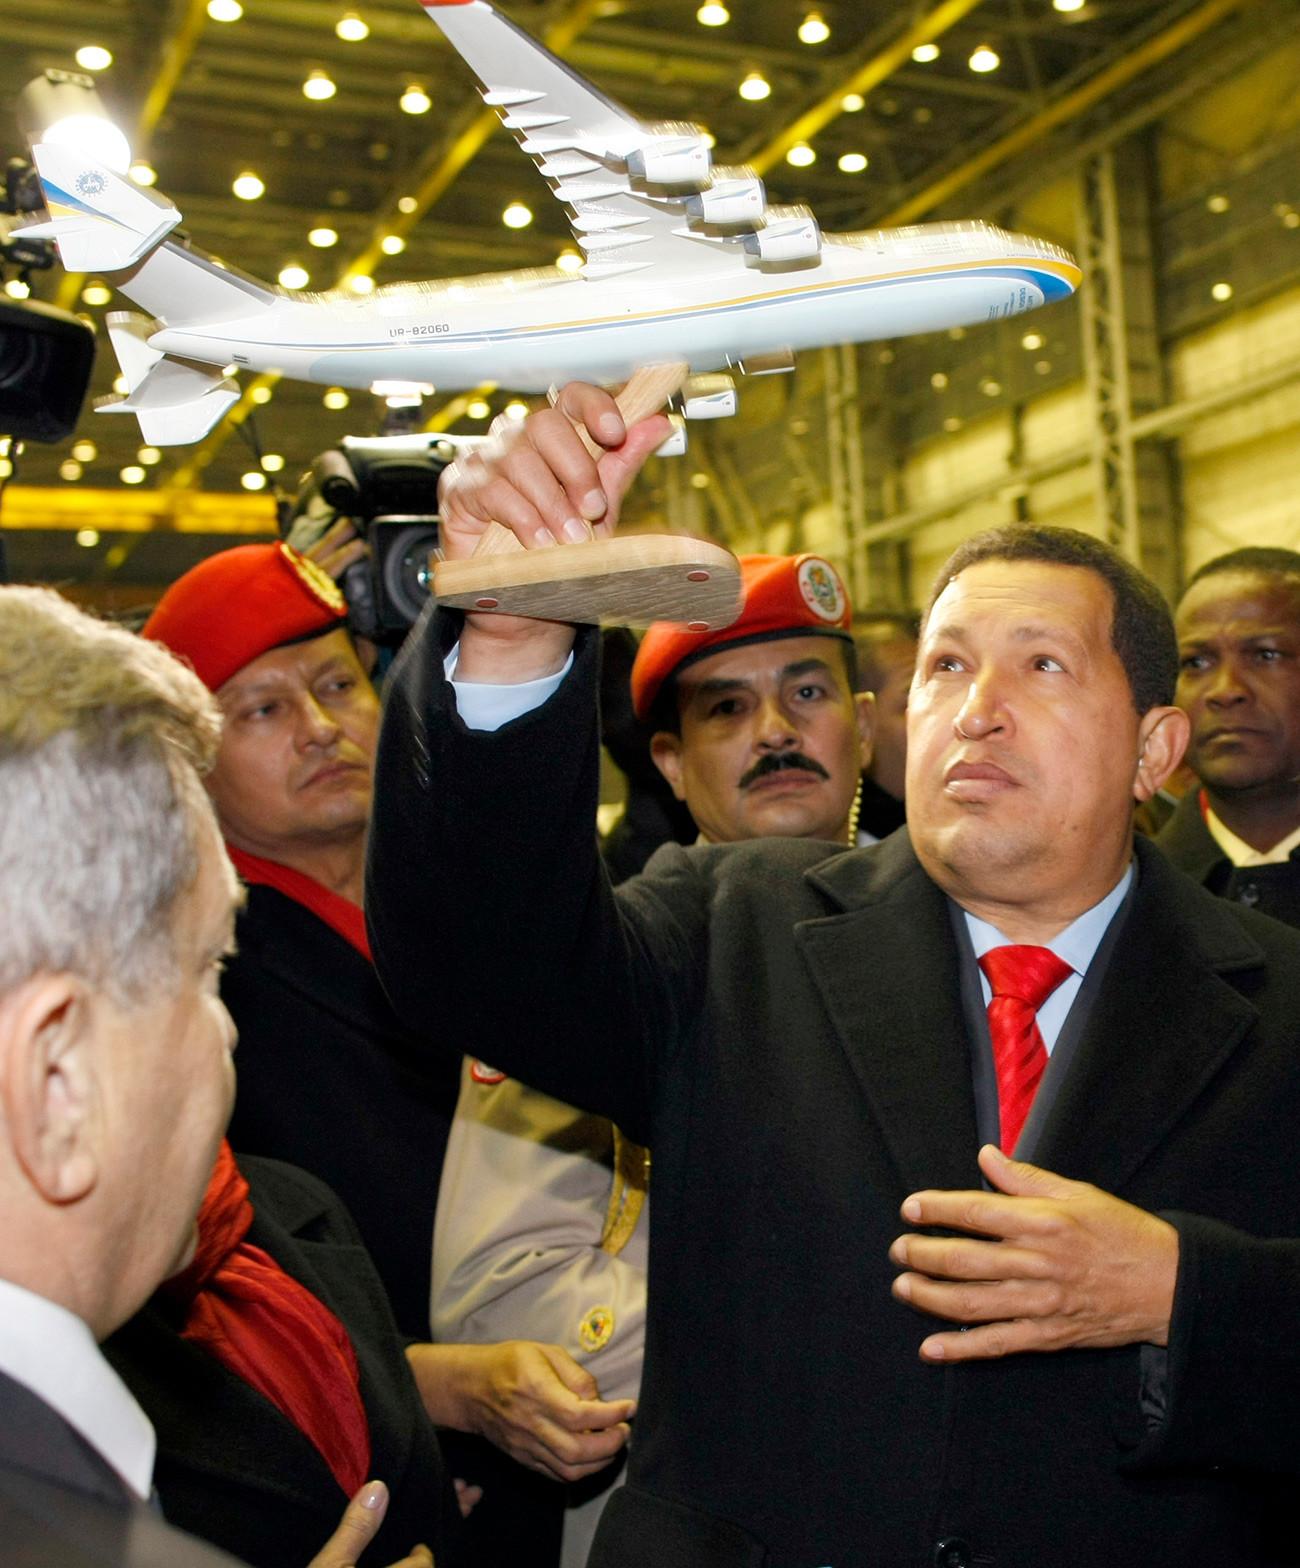 Predsjednik Venezuele Hugo Chavez drži model aviona An-225